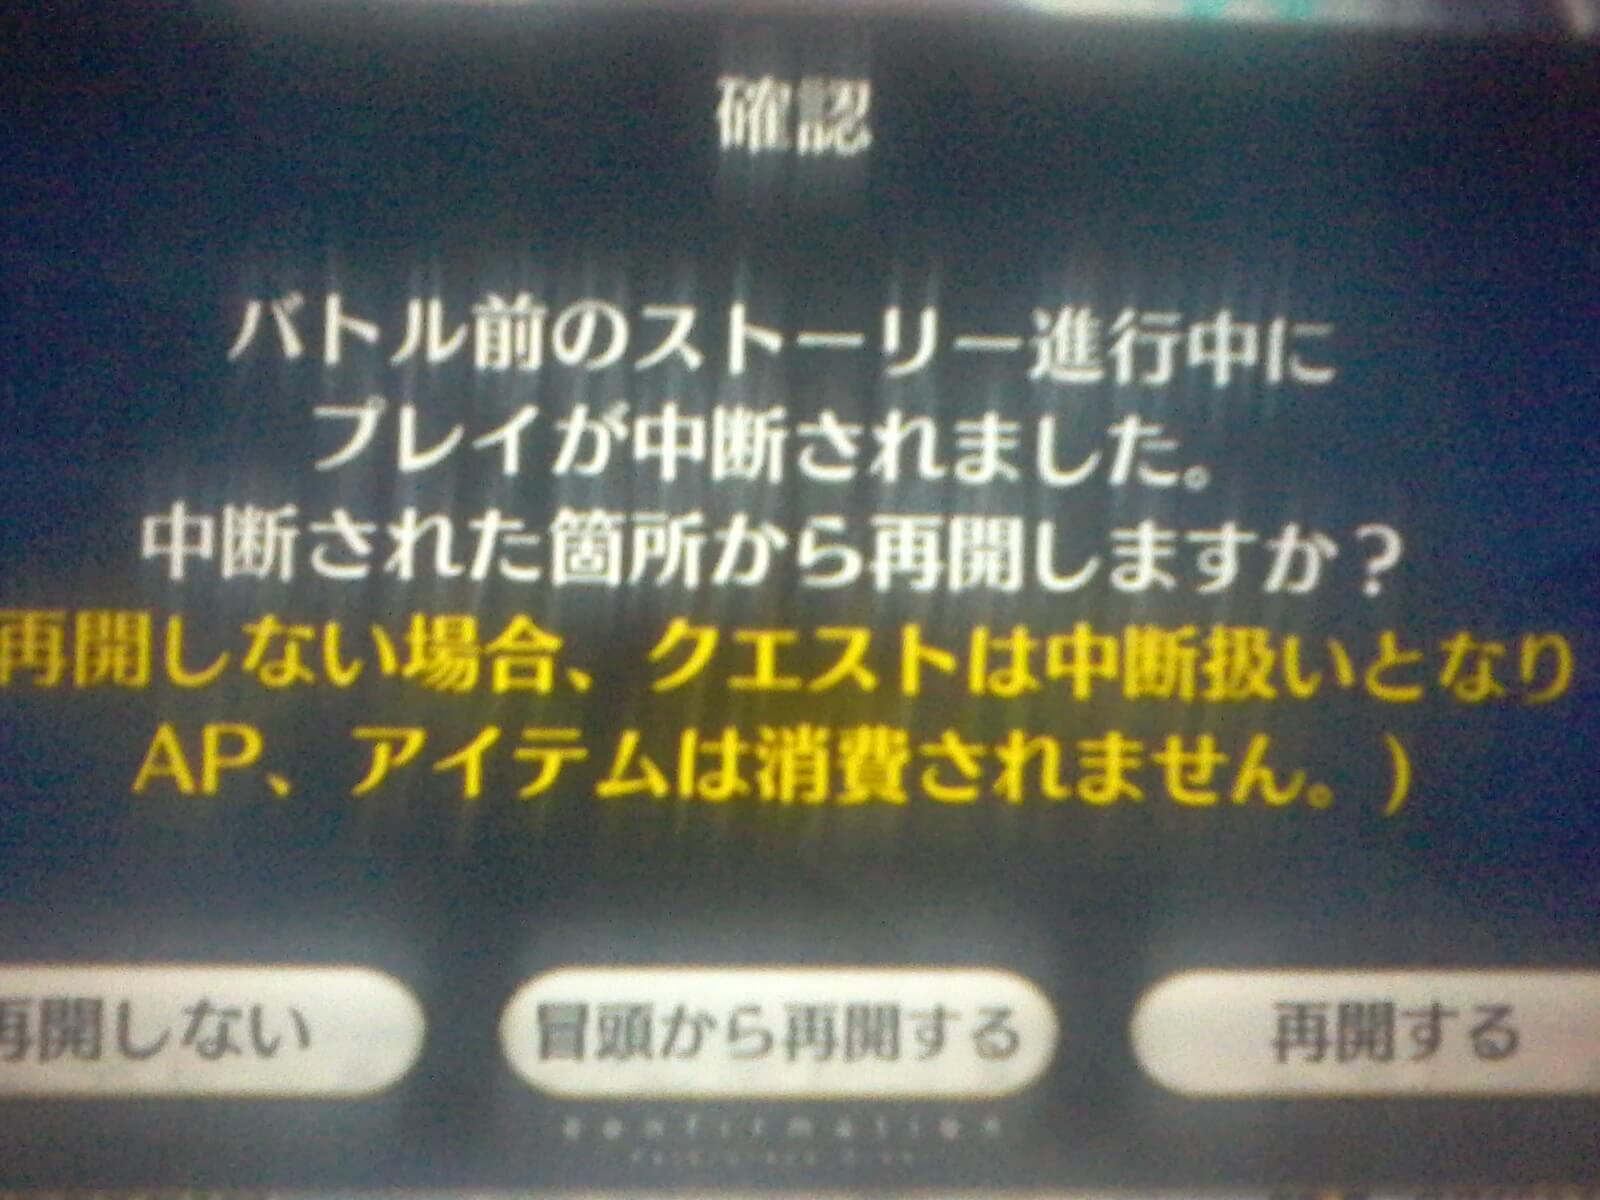 Fgo (jp) home screen yellow dialogue | Fate Grand Order Wiki - GamePress